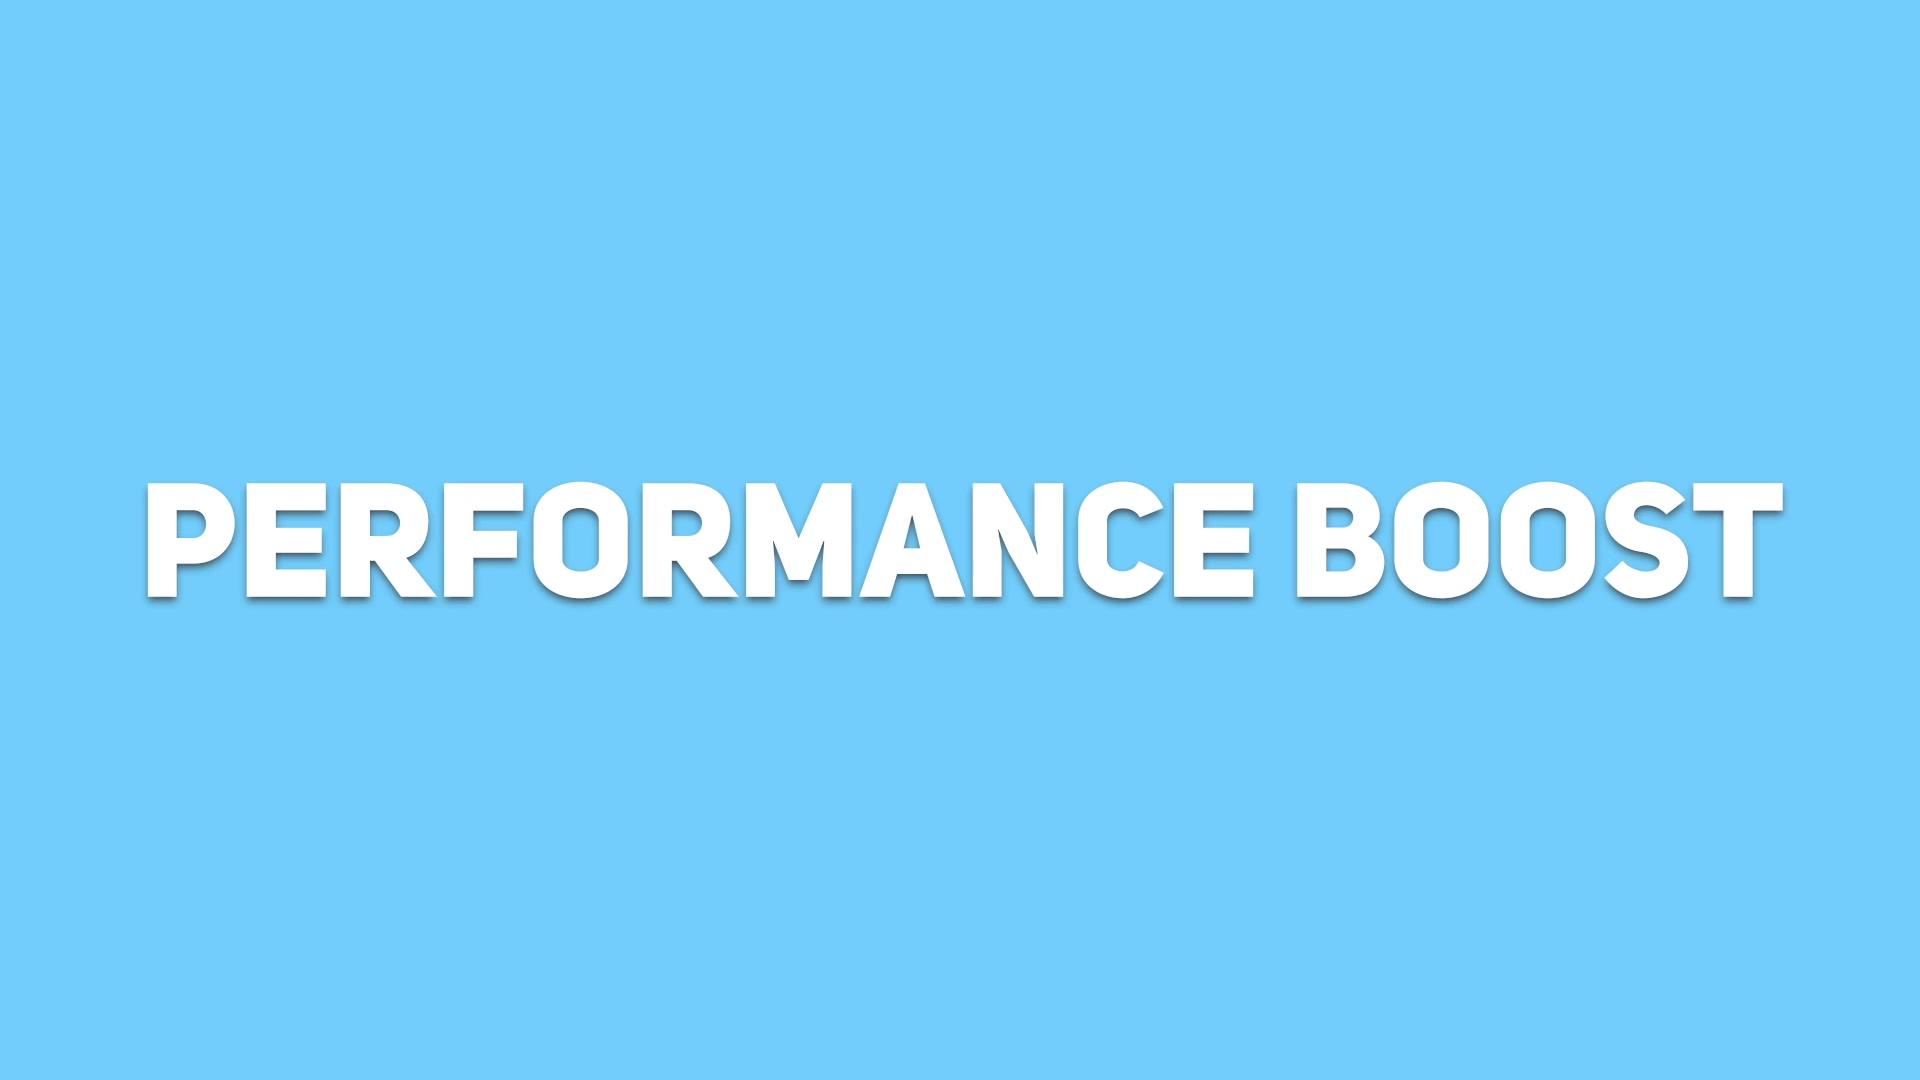 RCS - Performance Boost